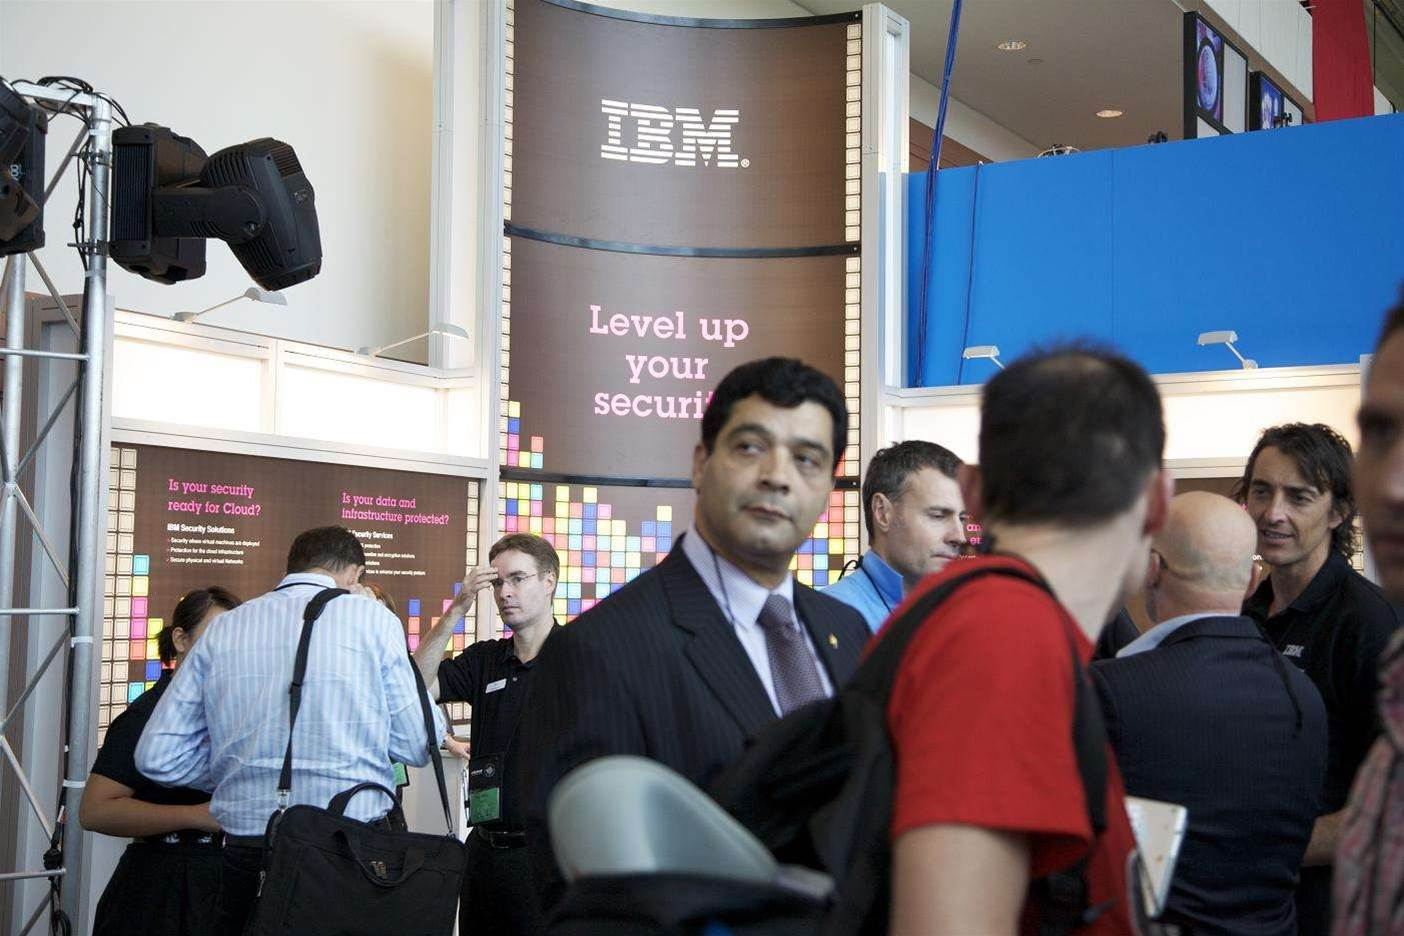 IBM unleashes virus on AusCERT delegates